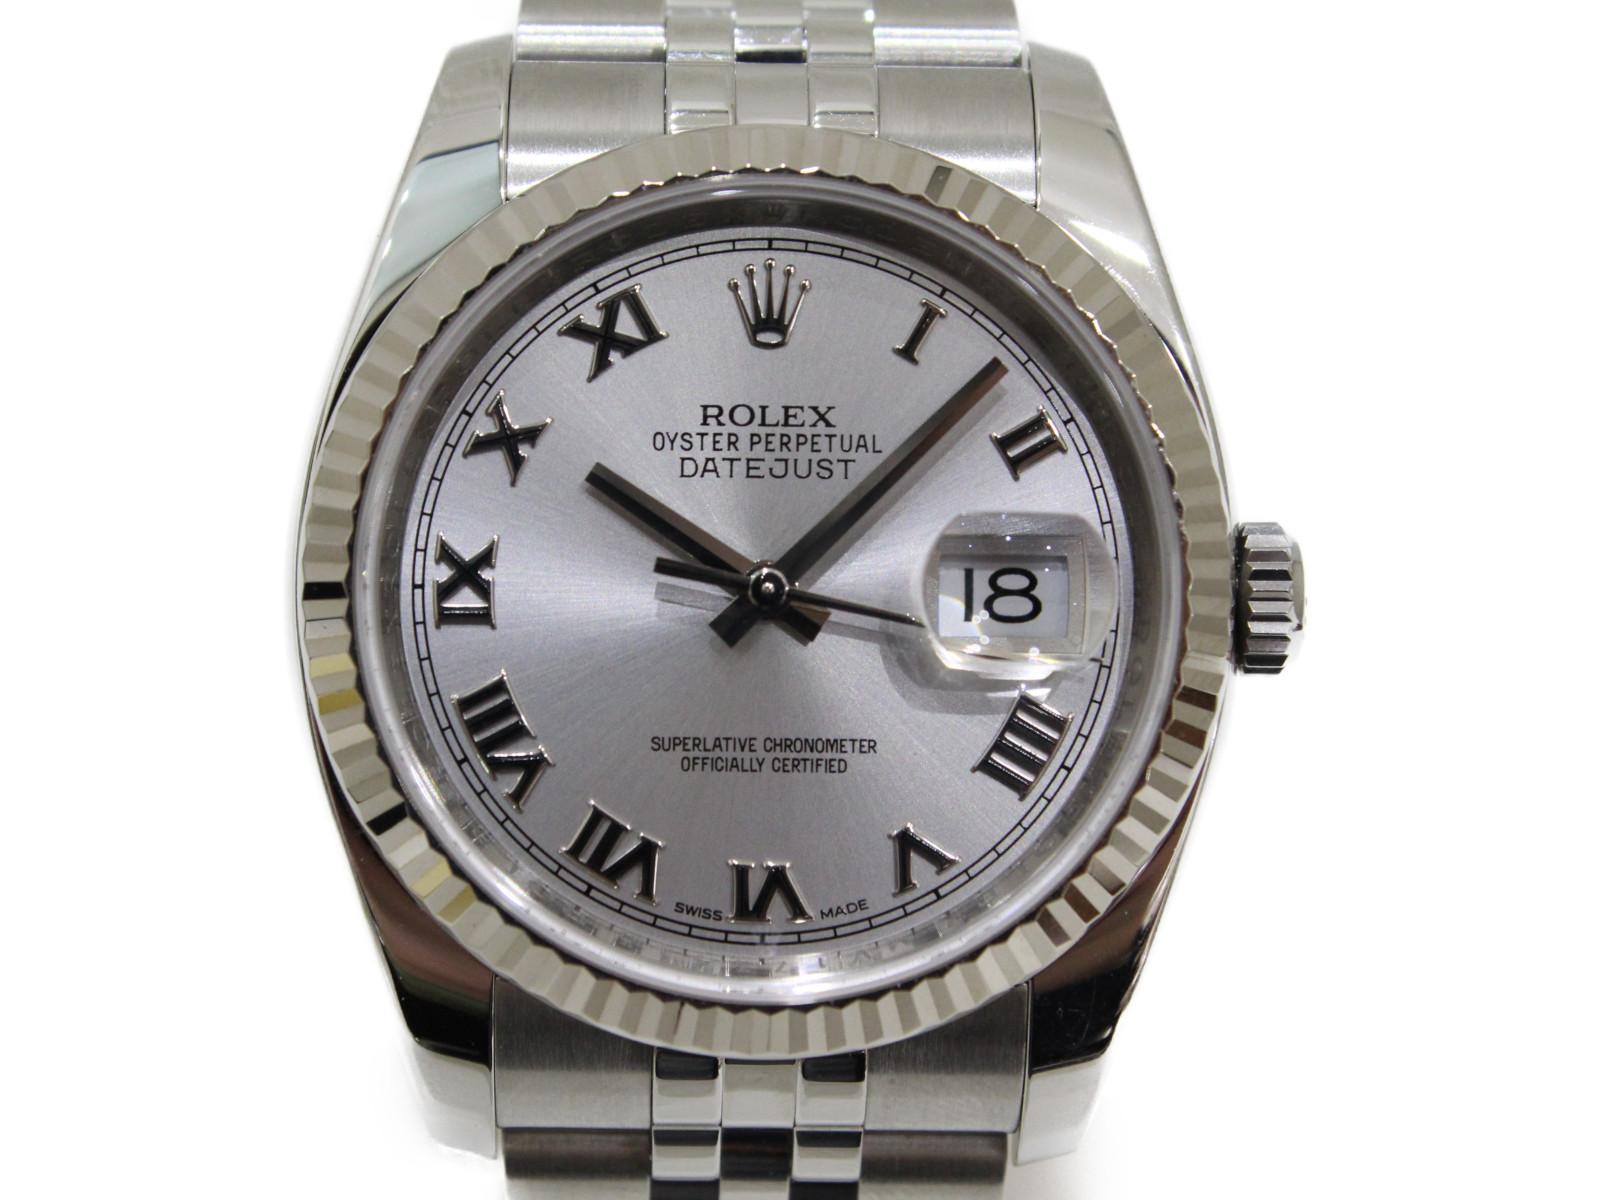 ROLEX ロレックス デイトジャスト 116234 ランダム 2014年 自動巻き デイト K18WG SS シルバー メンズ 腕時計【中古】